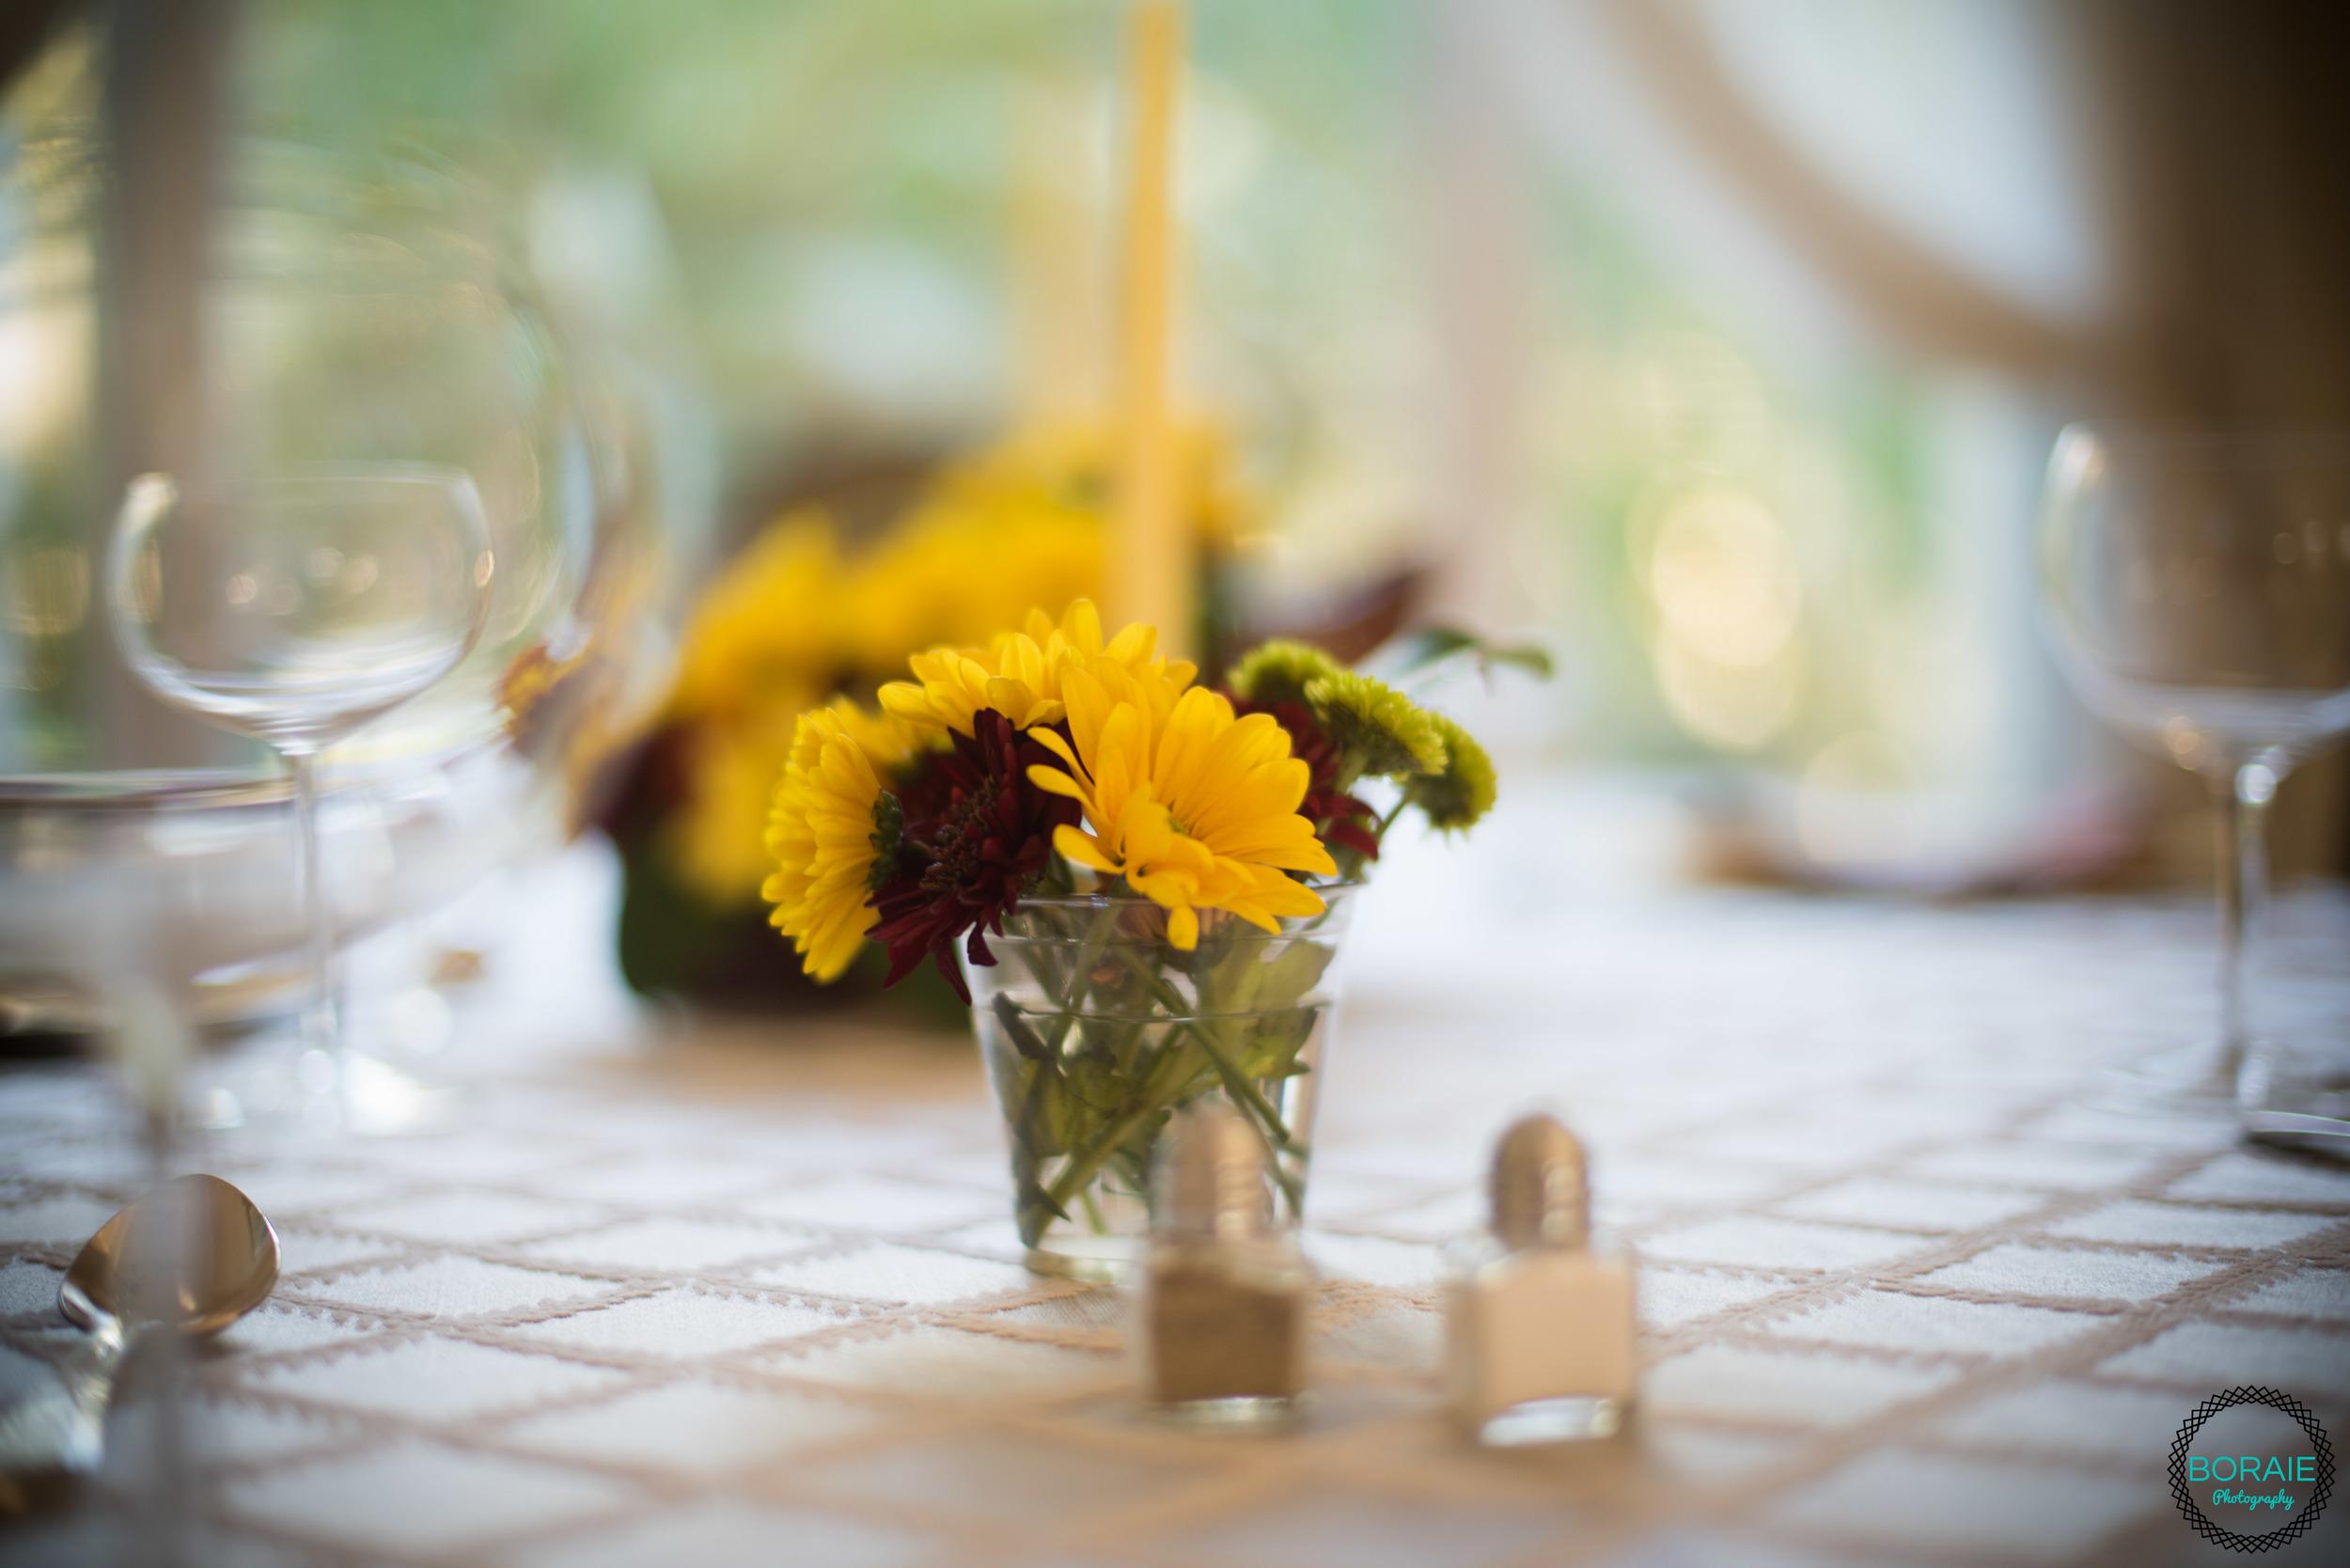 Thanksgiving - (www.boraiephotography.com) -7.JPG